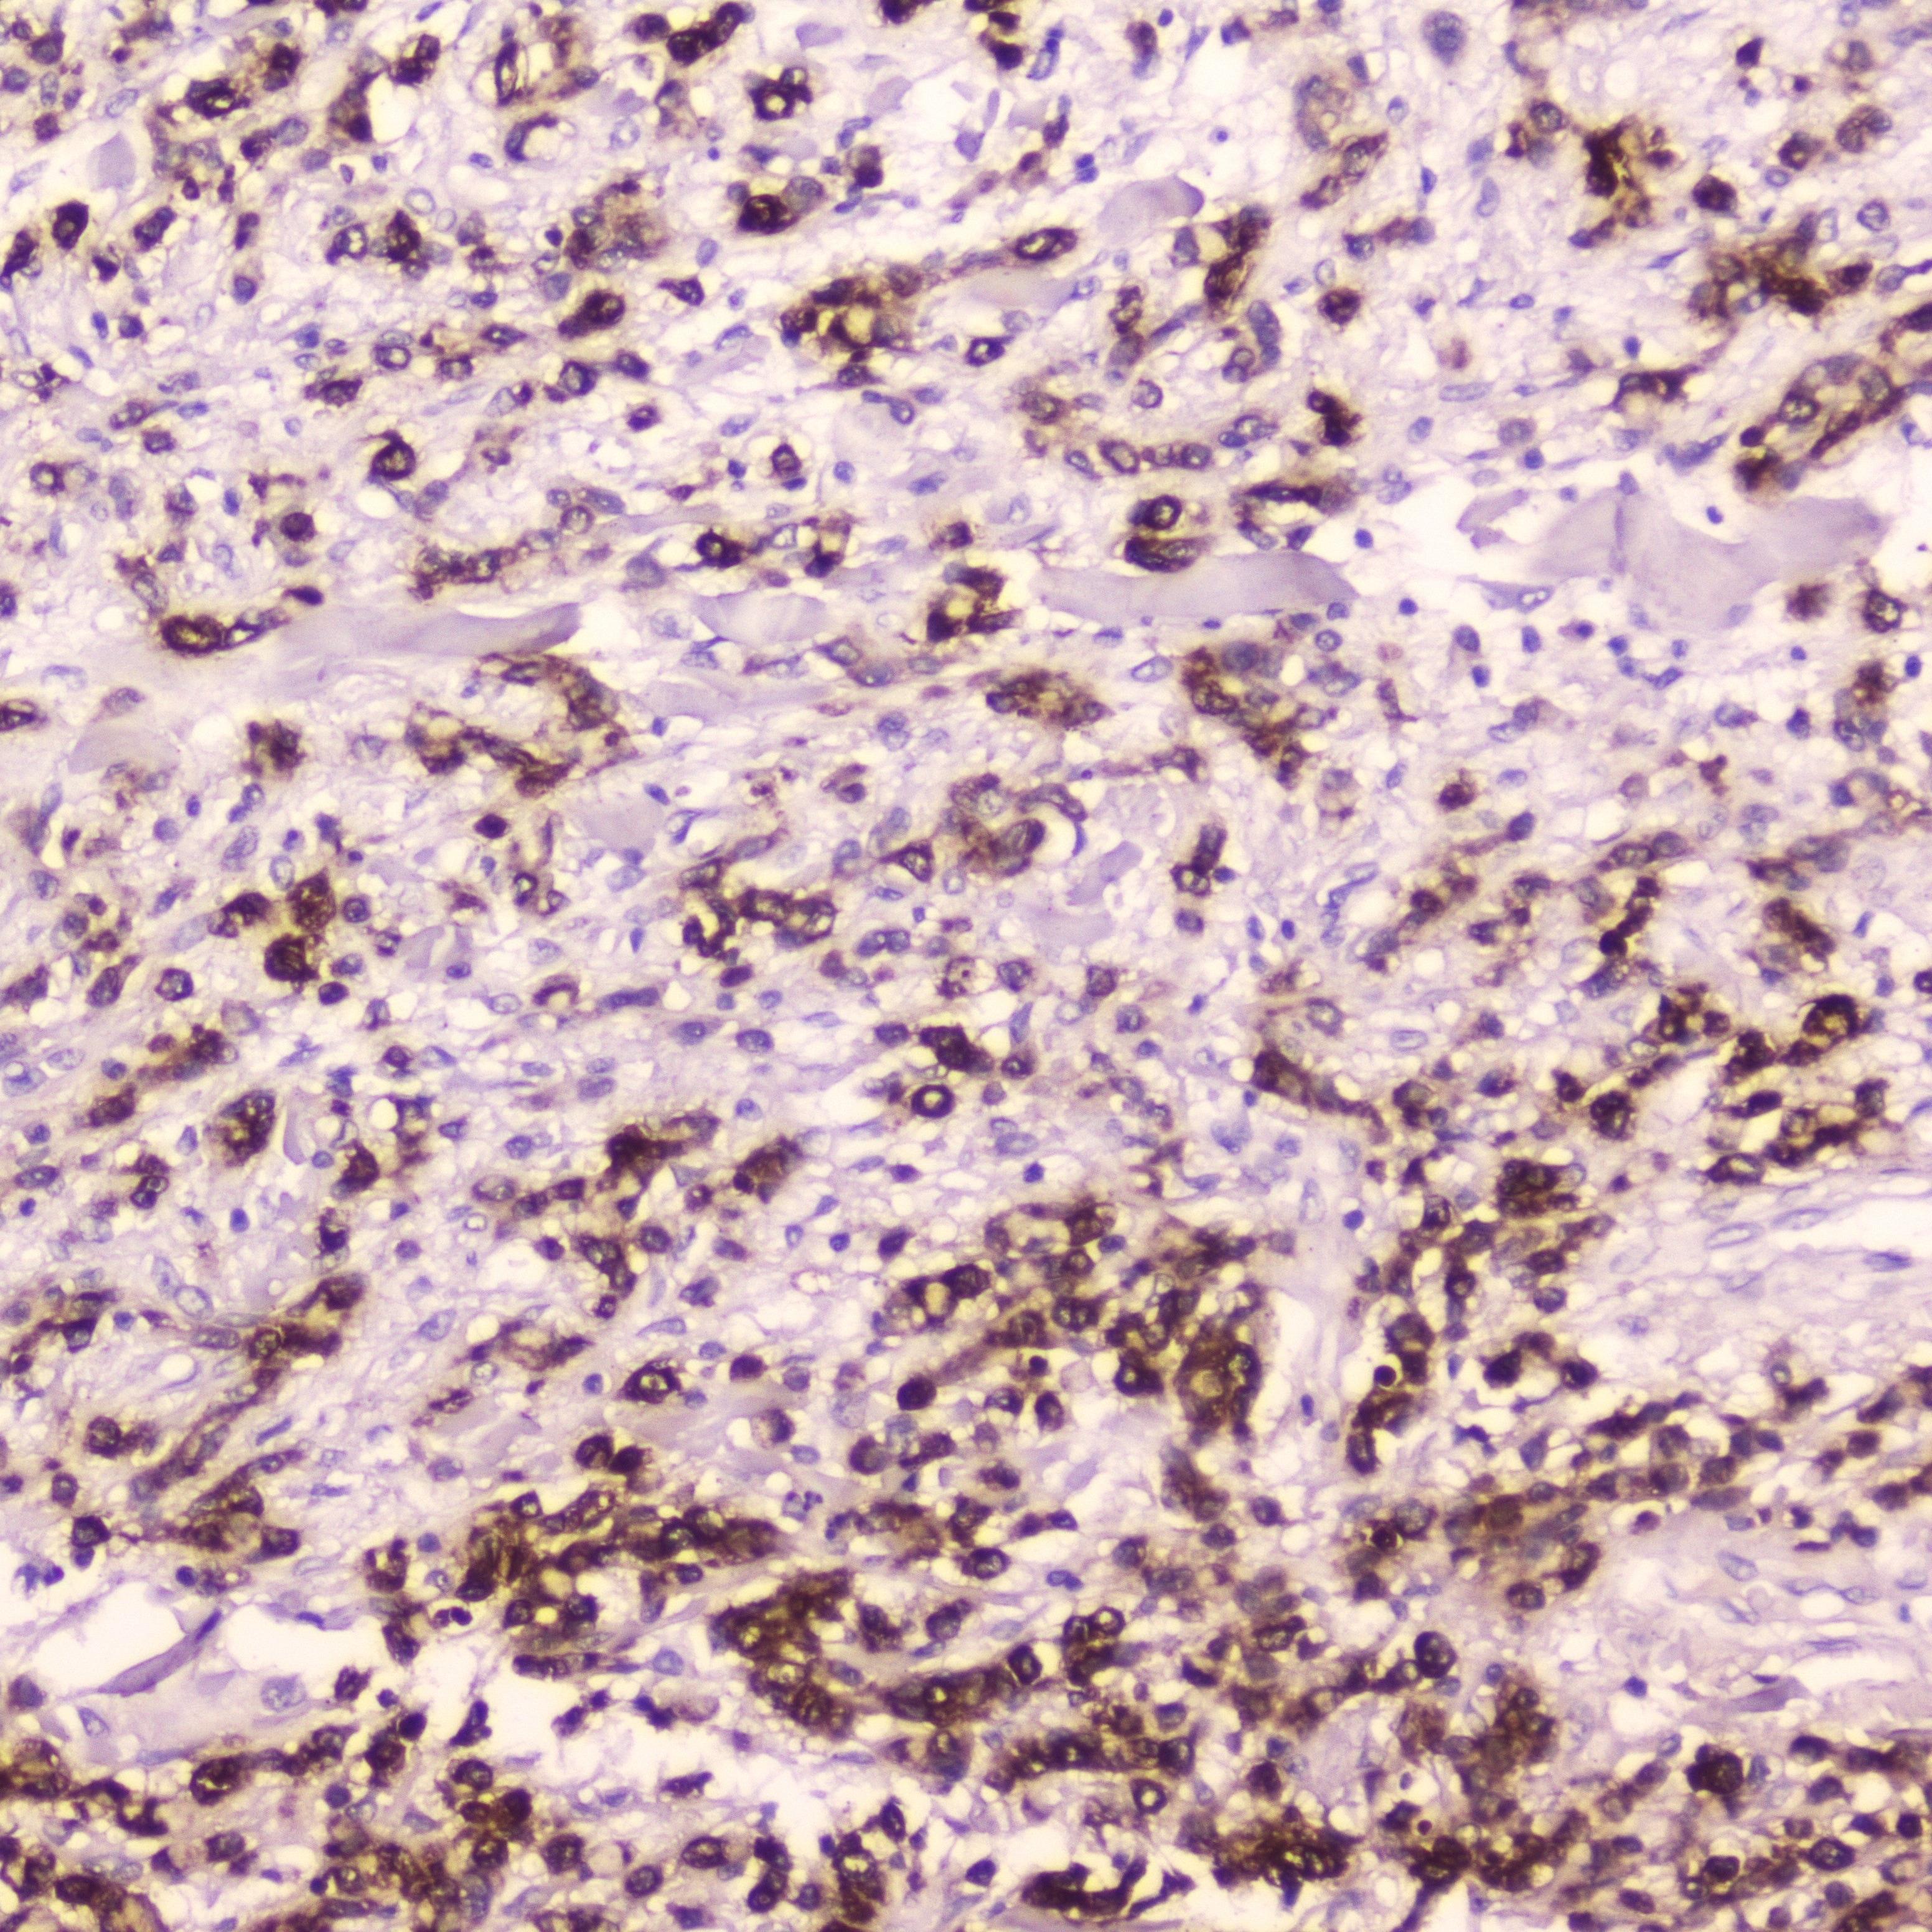 Cathepsin E Antibody in Immunohistochemistry (Paraffin) (IHC (P))